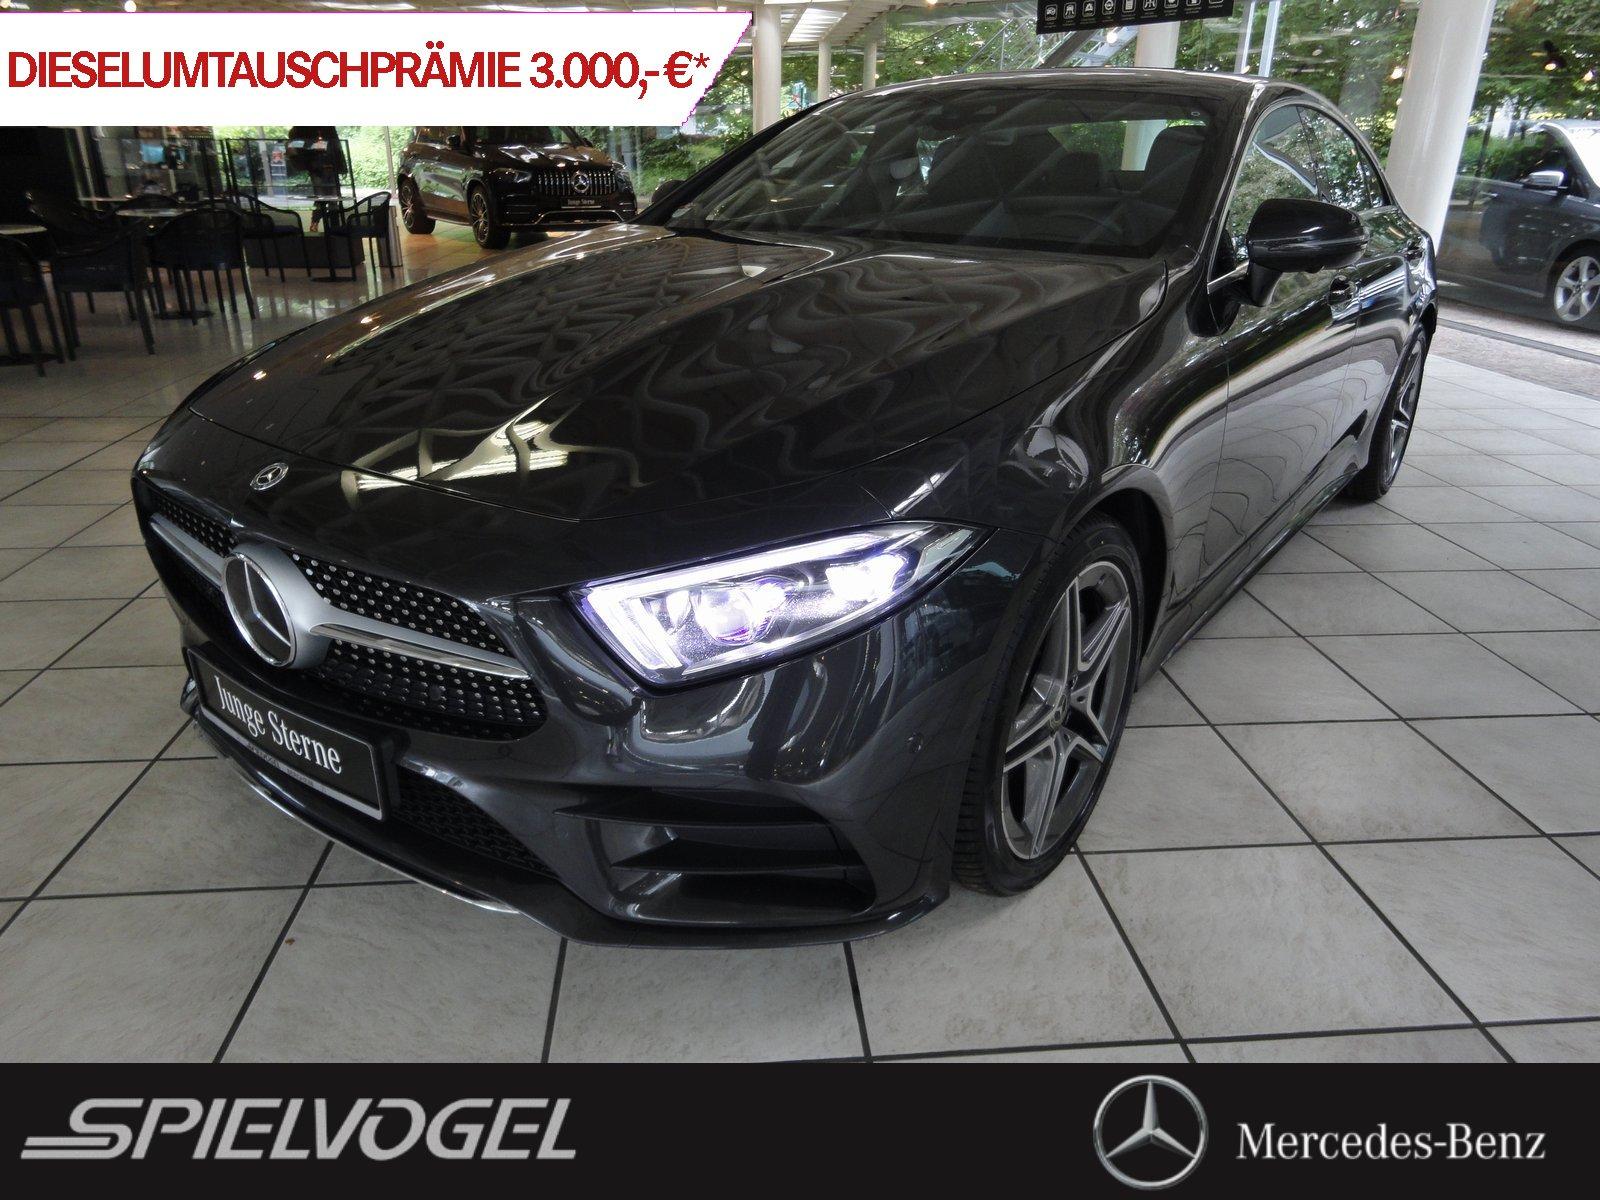 Mercedes-Benz CLS 450 4M AMG MBUX SHD MBEAM 360° ASSISTENZ, Jahr 2020, Benzin